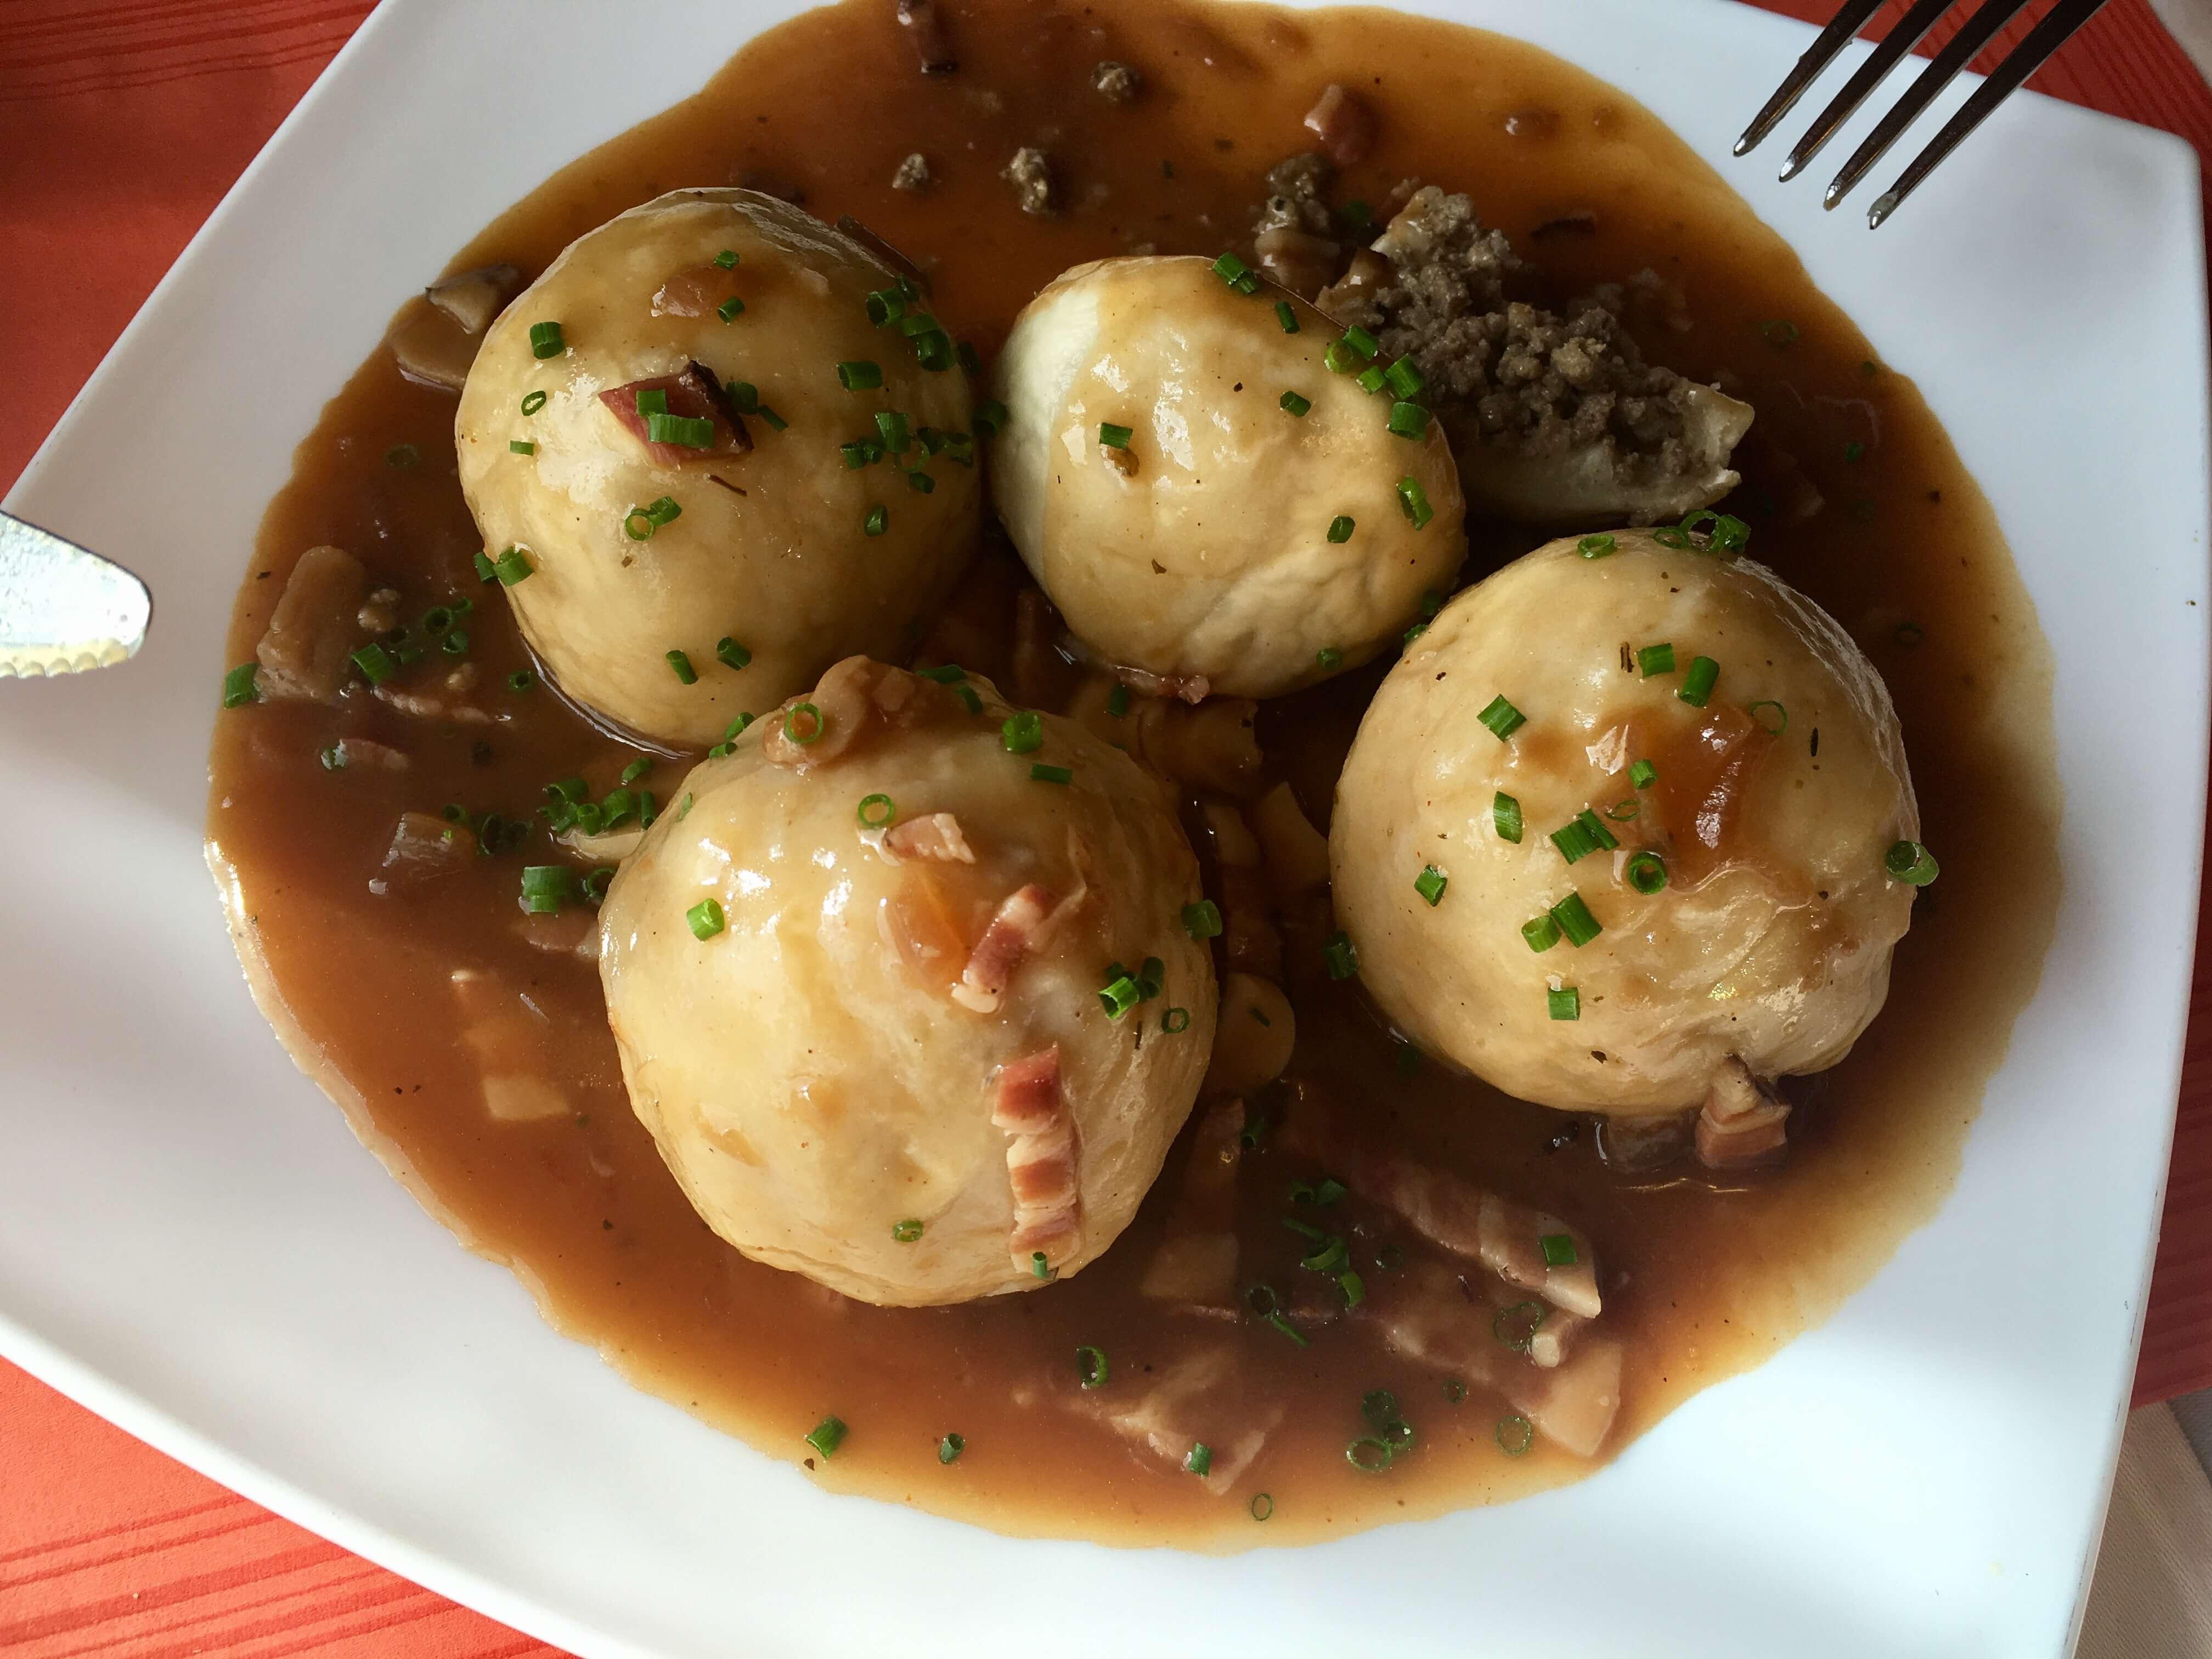 Knödel is the form of dumpling